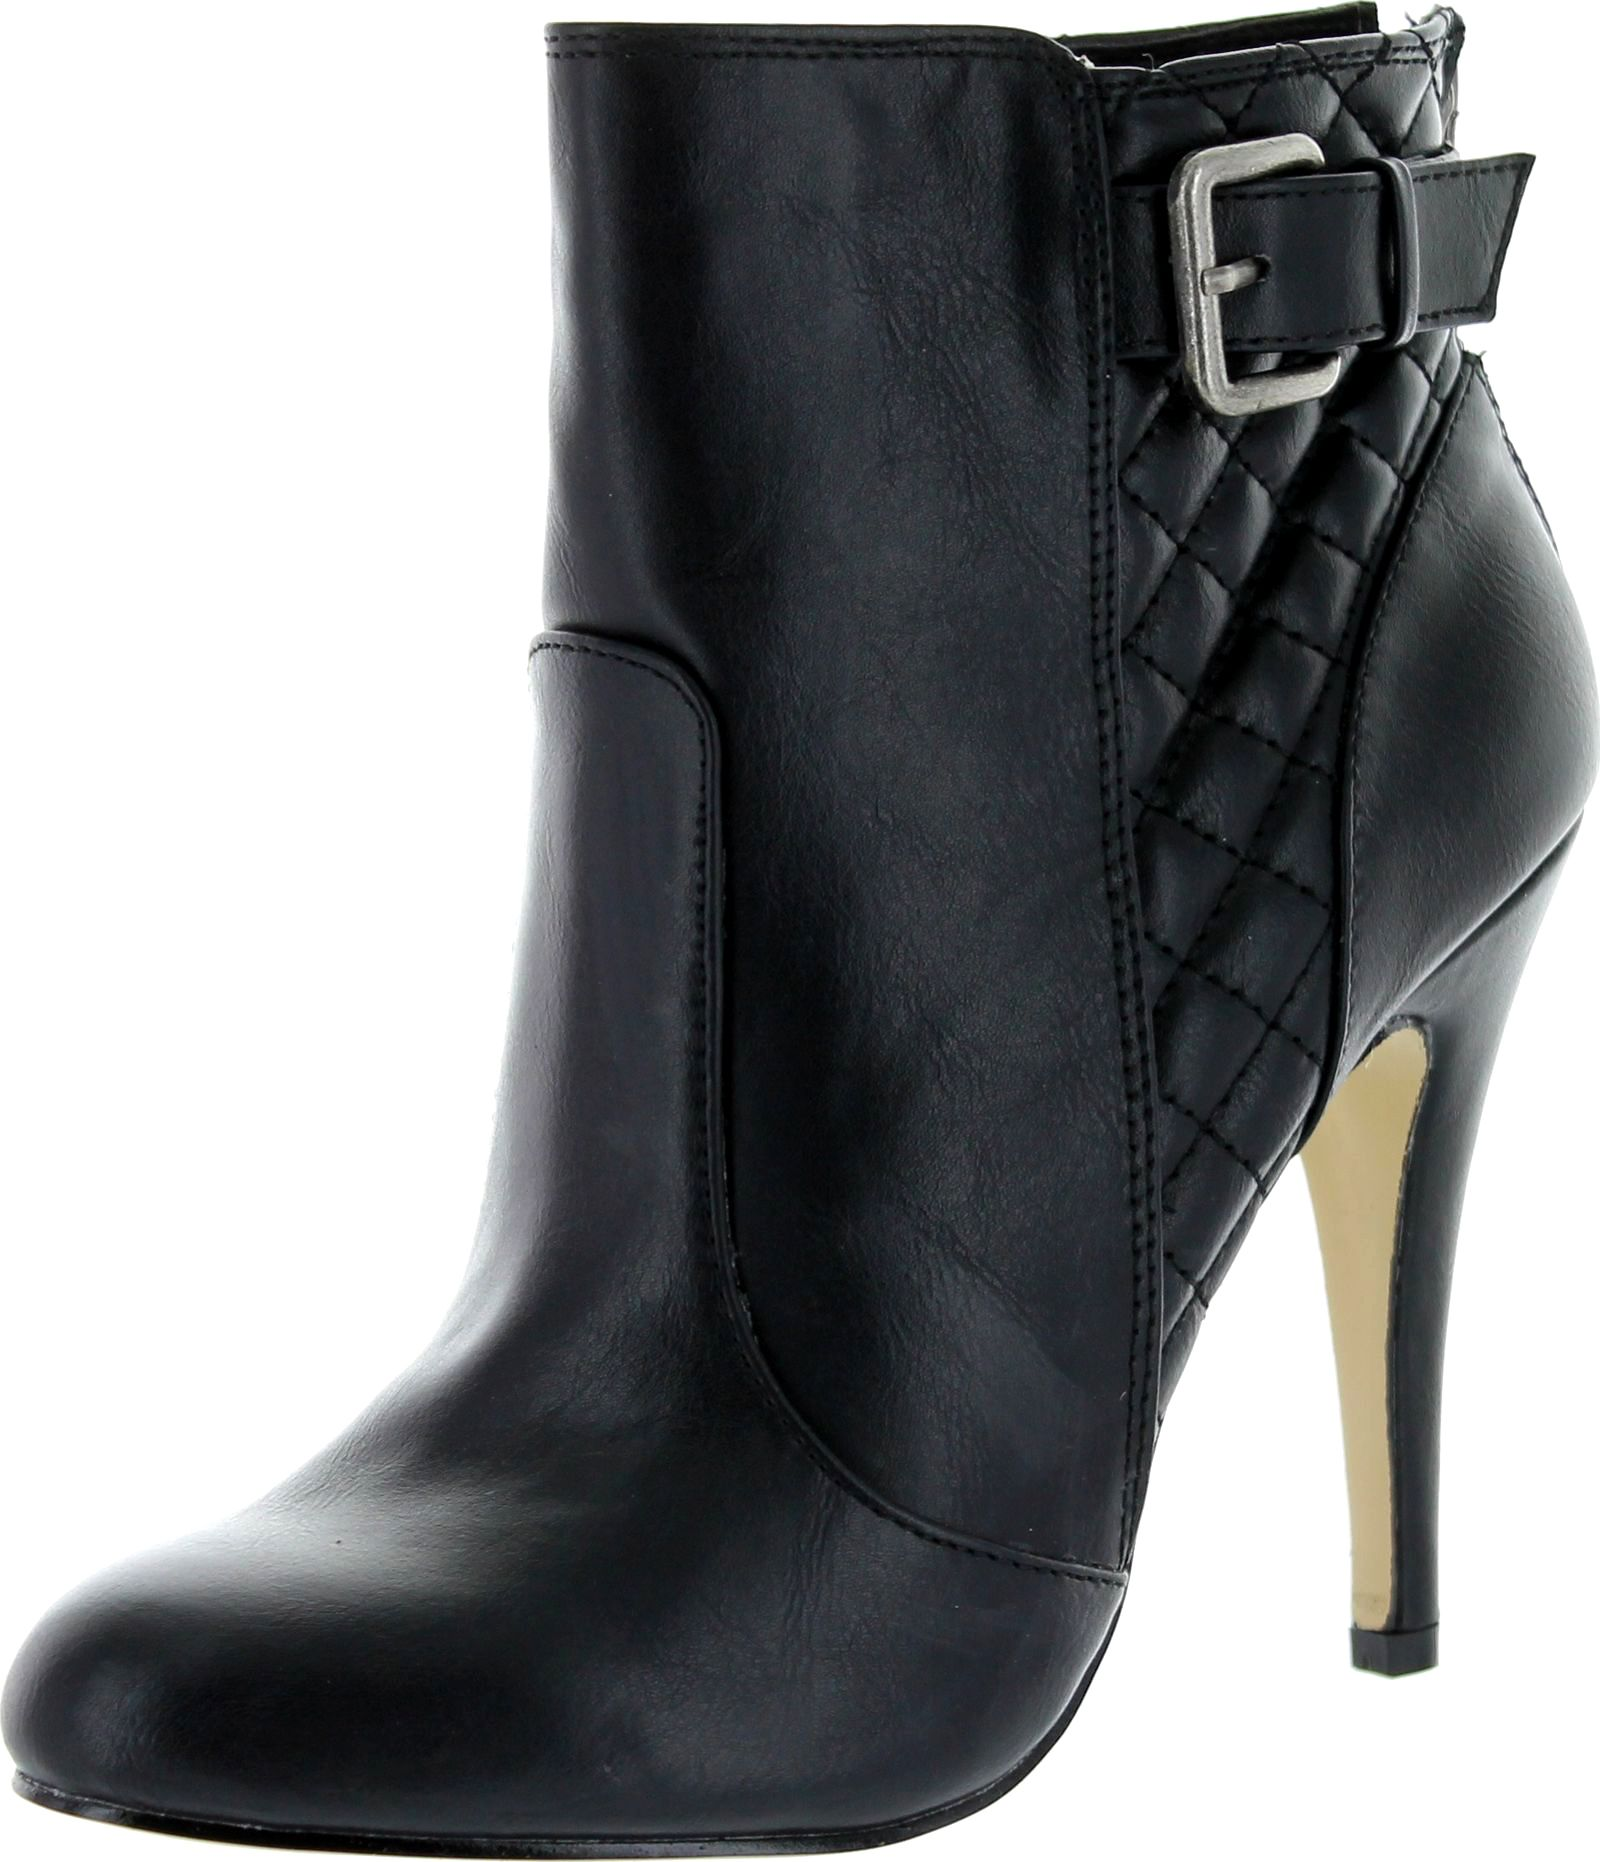 Madden Girl Damenschuhe Arianna Heel Fashion Booties